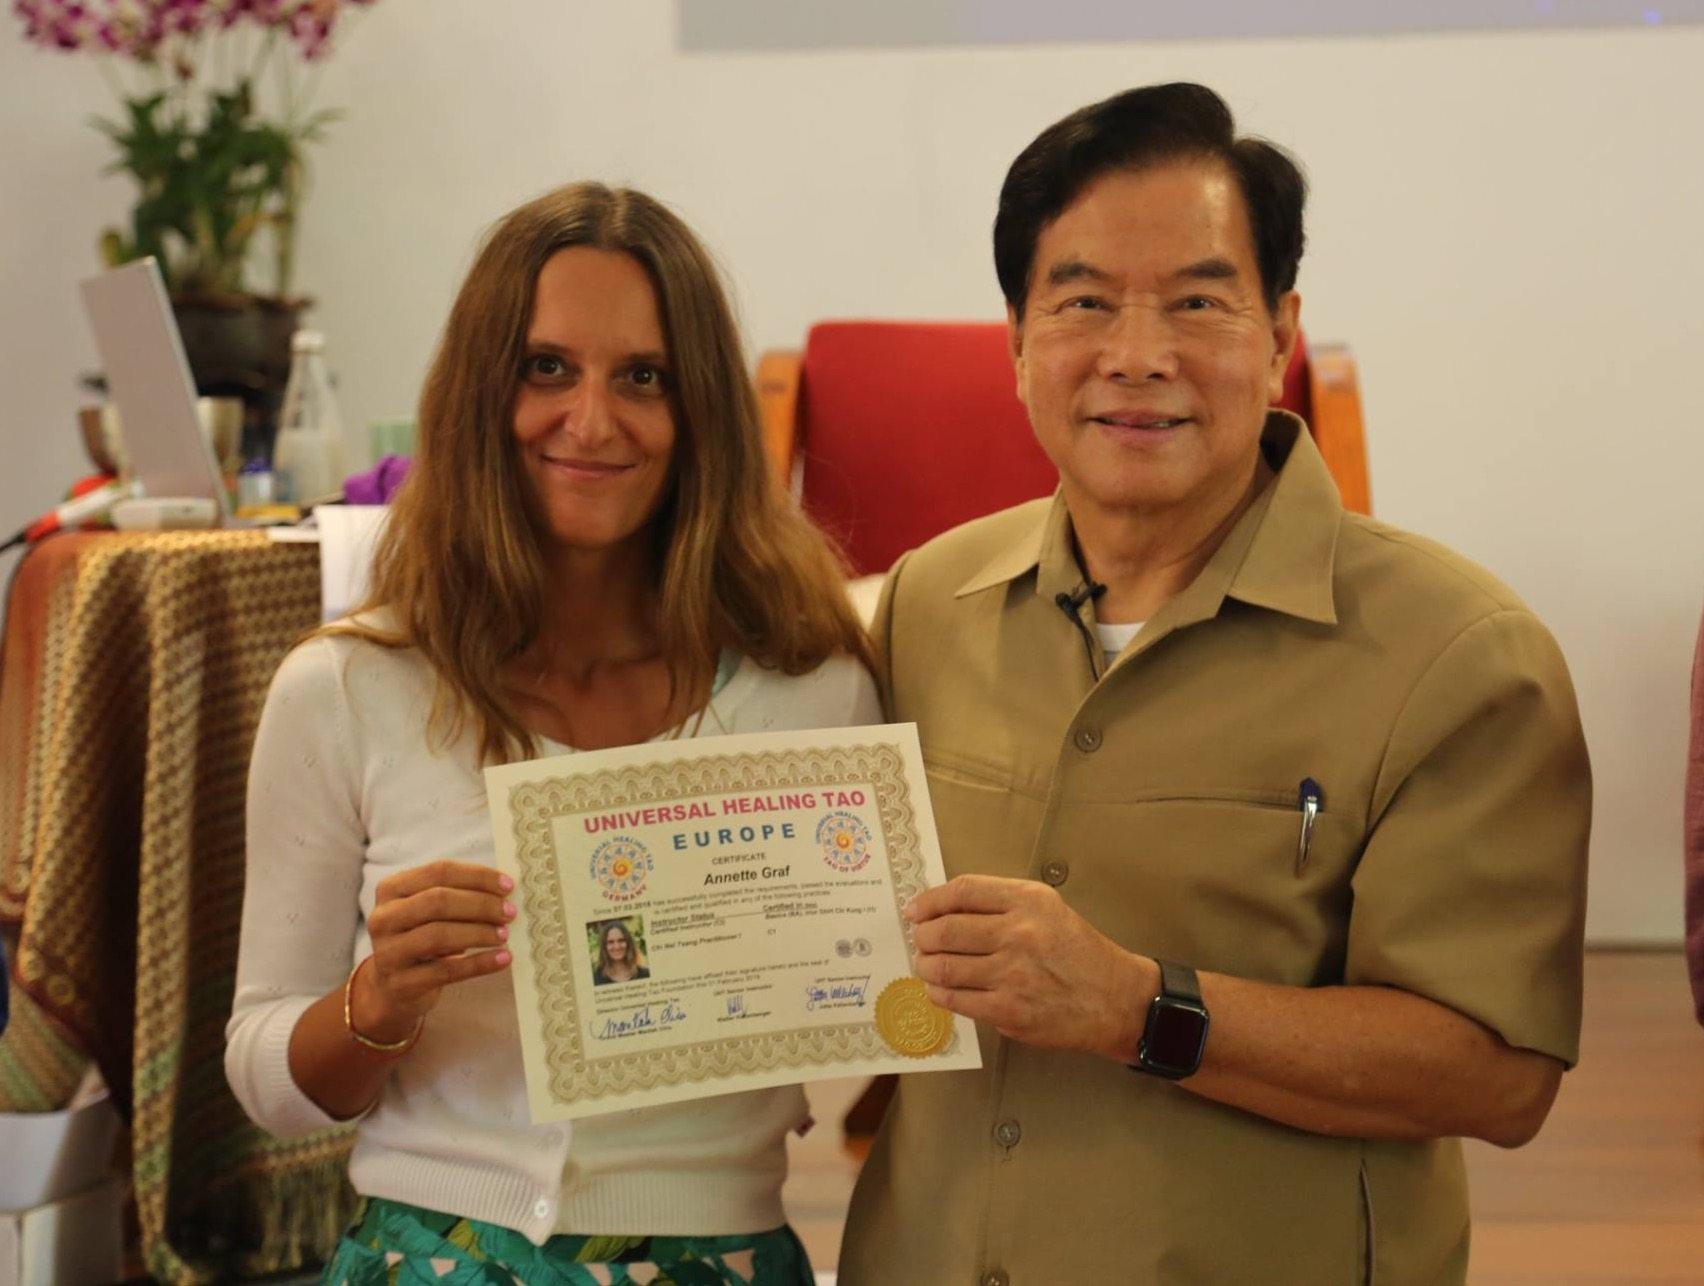 Certification Tao Garden Annette and Master Mantak Chia